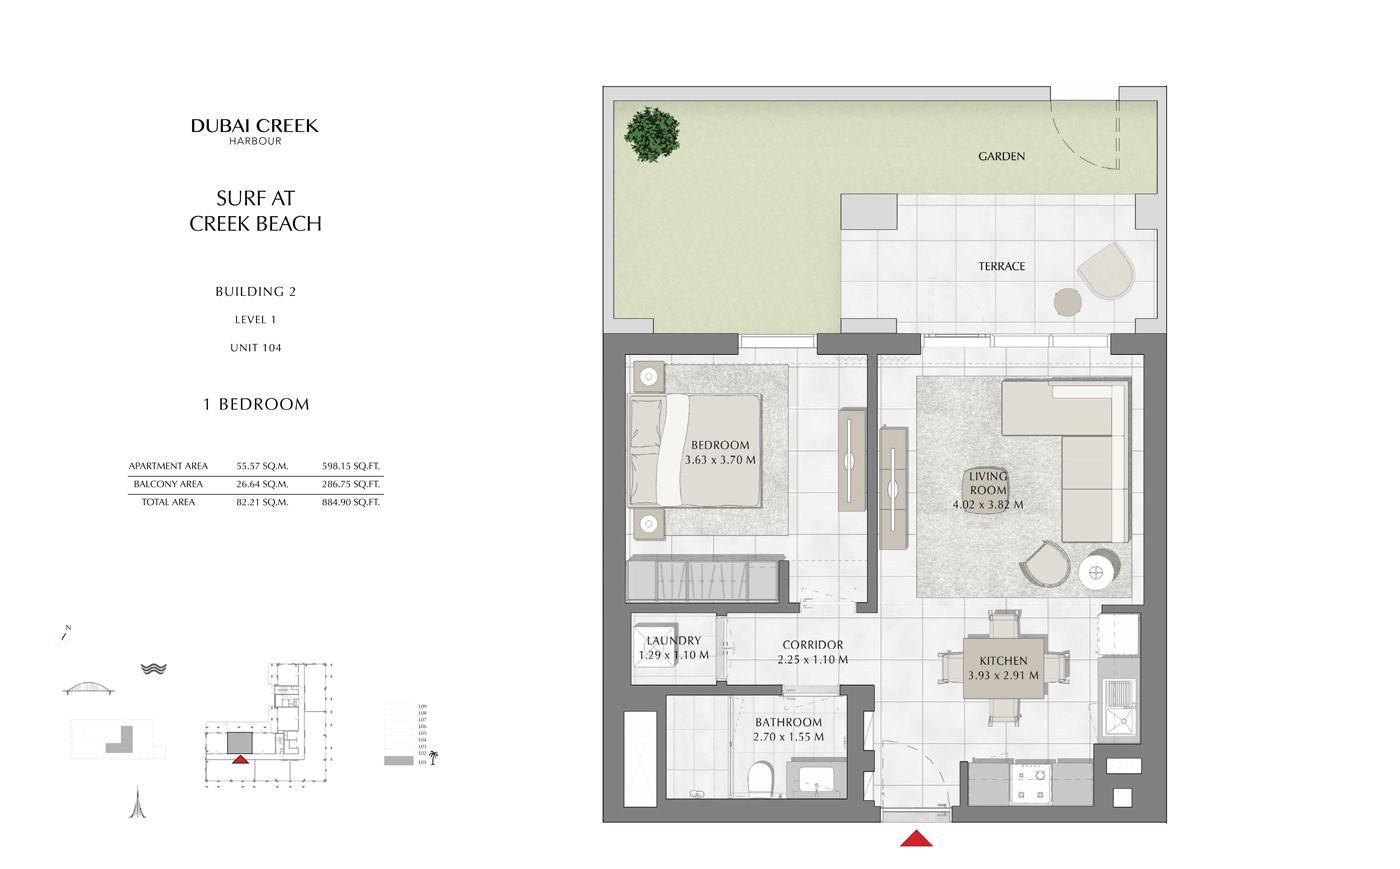 Building 2, 1 Bedroom Level 1, Unit 104, Size 884 Sq Ft